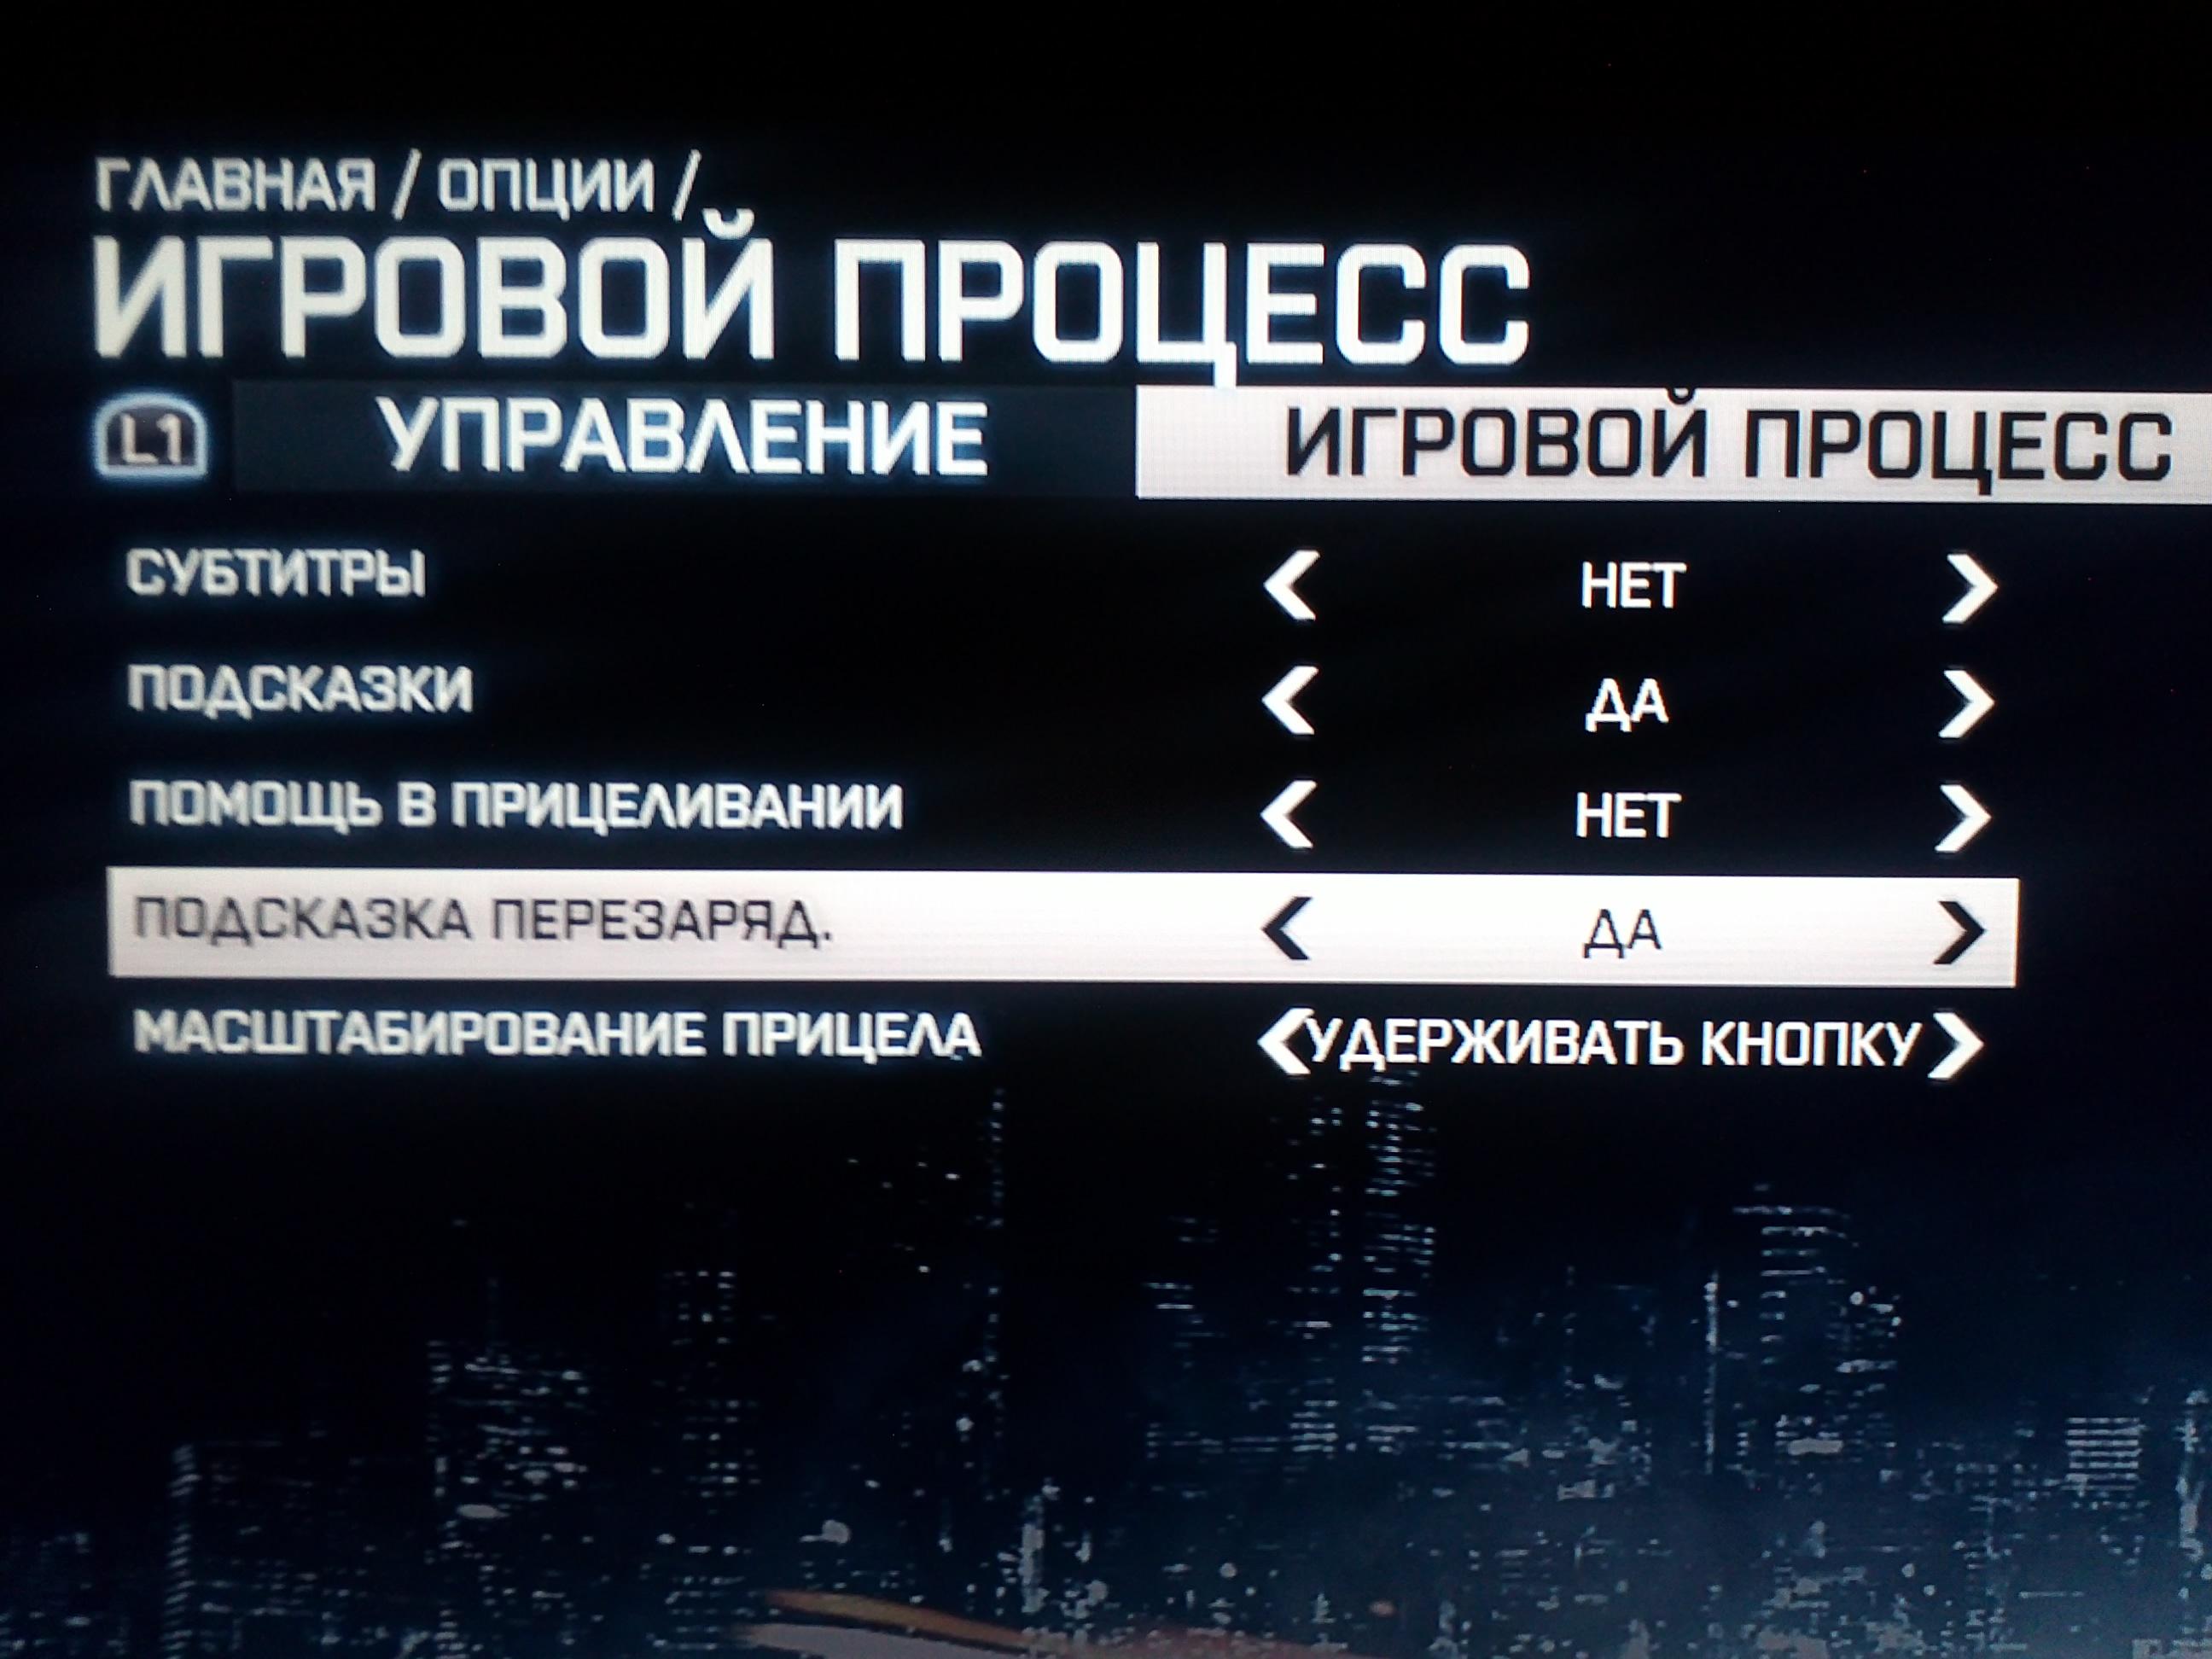 FK-remont.ru - Страница 15